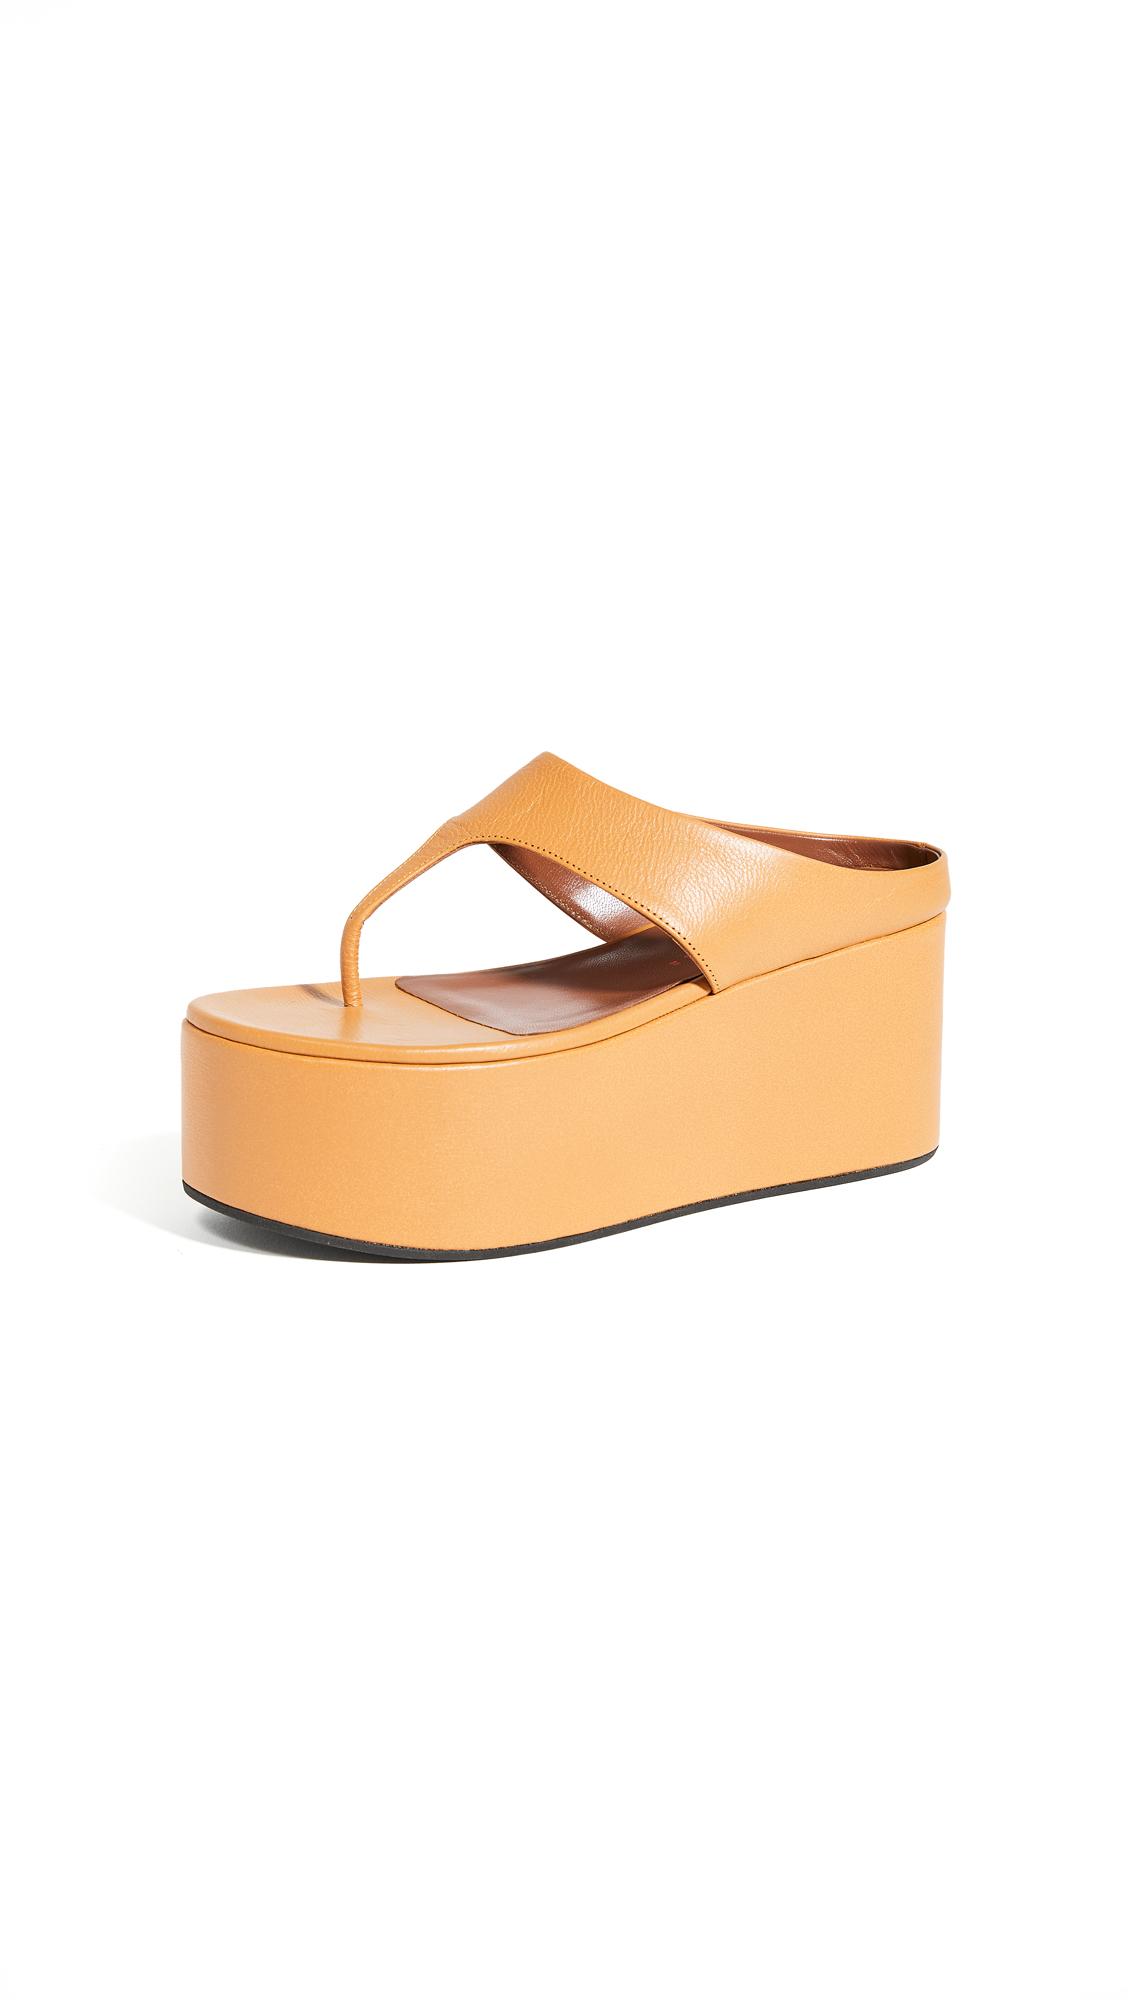 Buy Simon Miller Coaster Thong Sandals online, shop Simon Miller